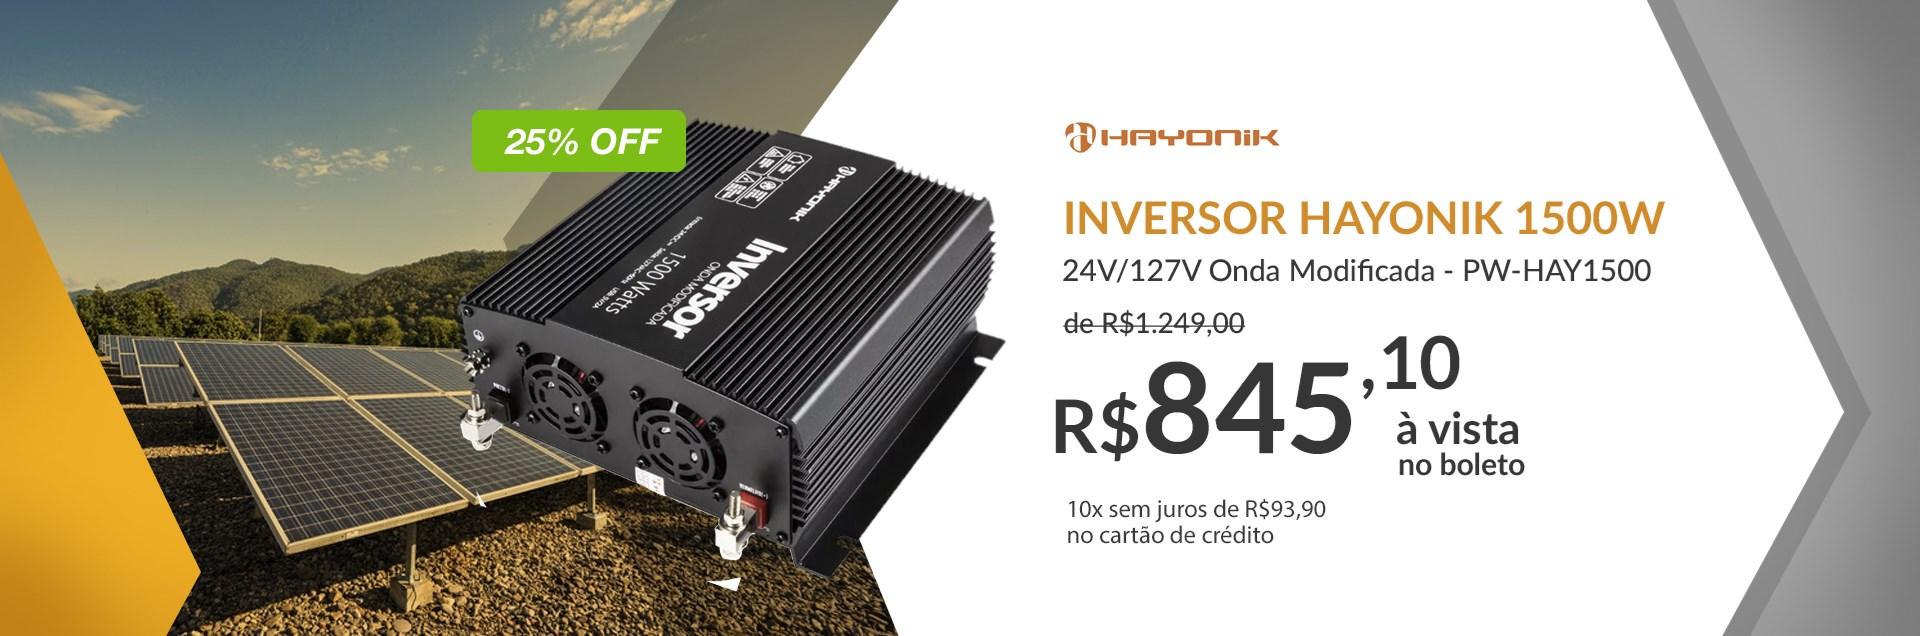 Inversor Hayonik 1500